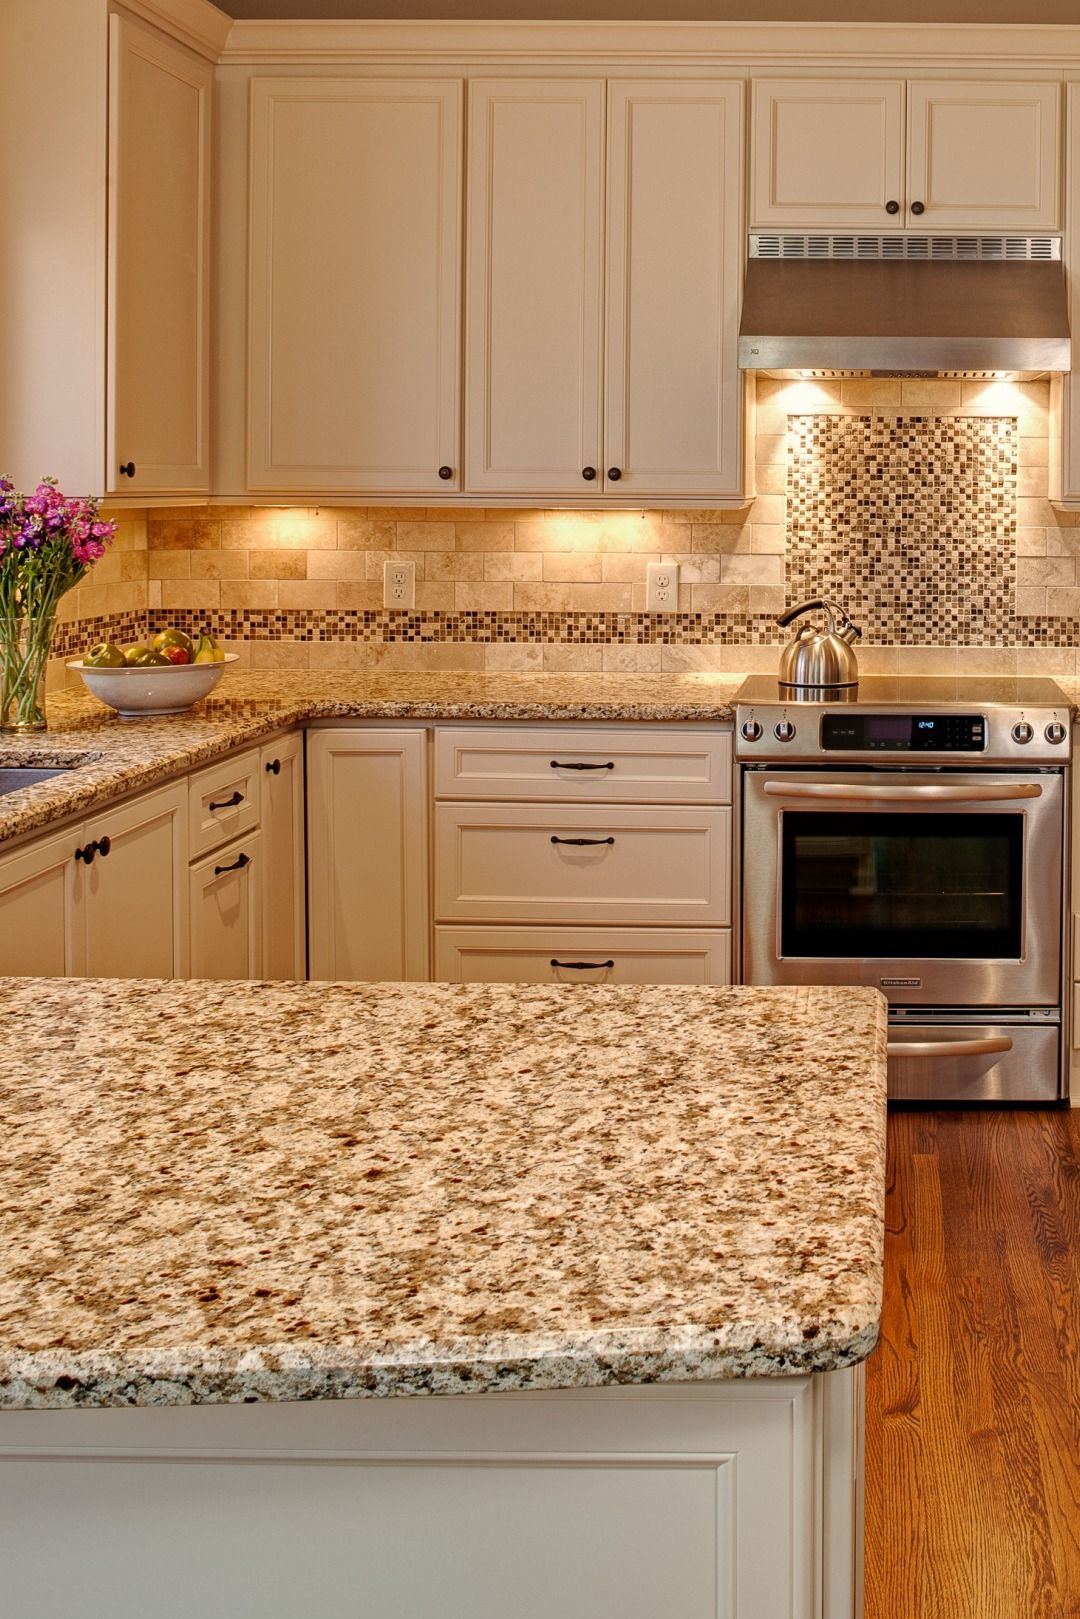 Giallo Napoli Granite Countertop White Cabinet Travertine Subway Style Backsplash Tile Dark Hardwood Floo Granite Countertops Kitchen Countertops Kitchen Decor